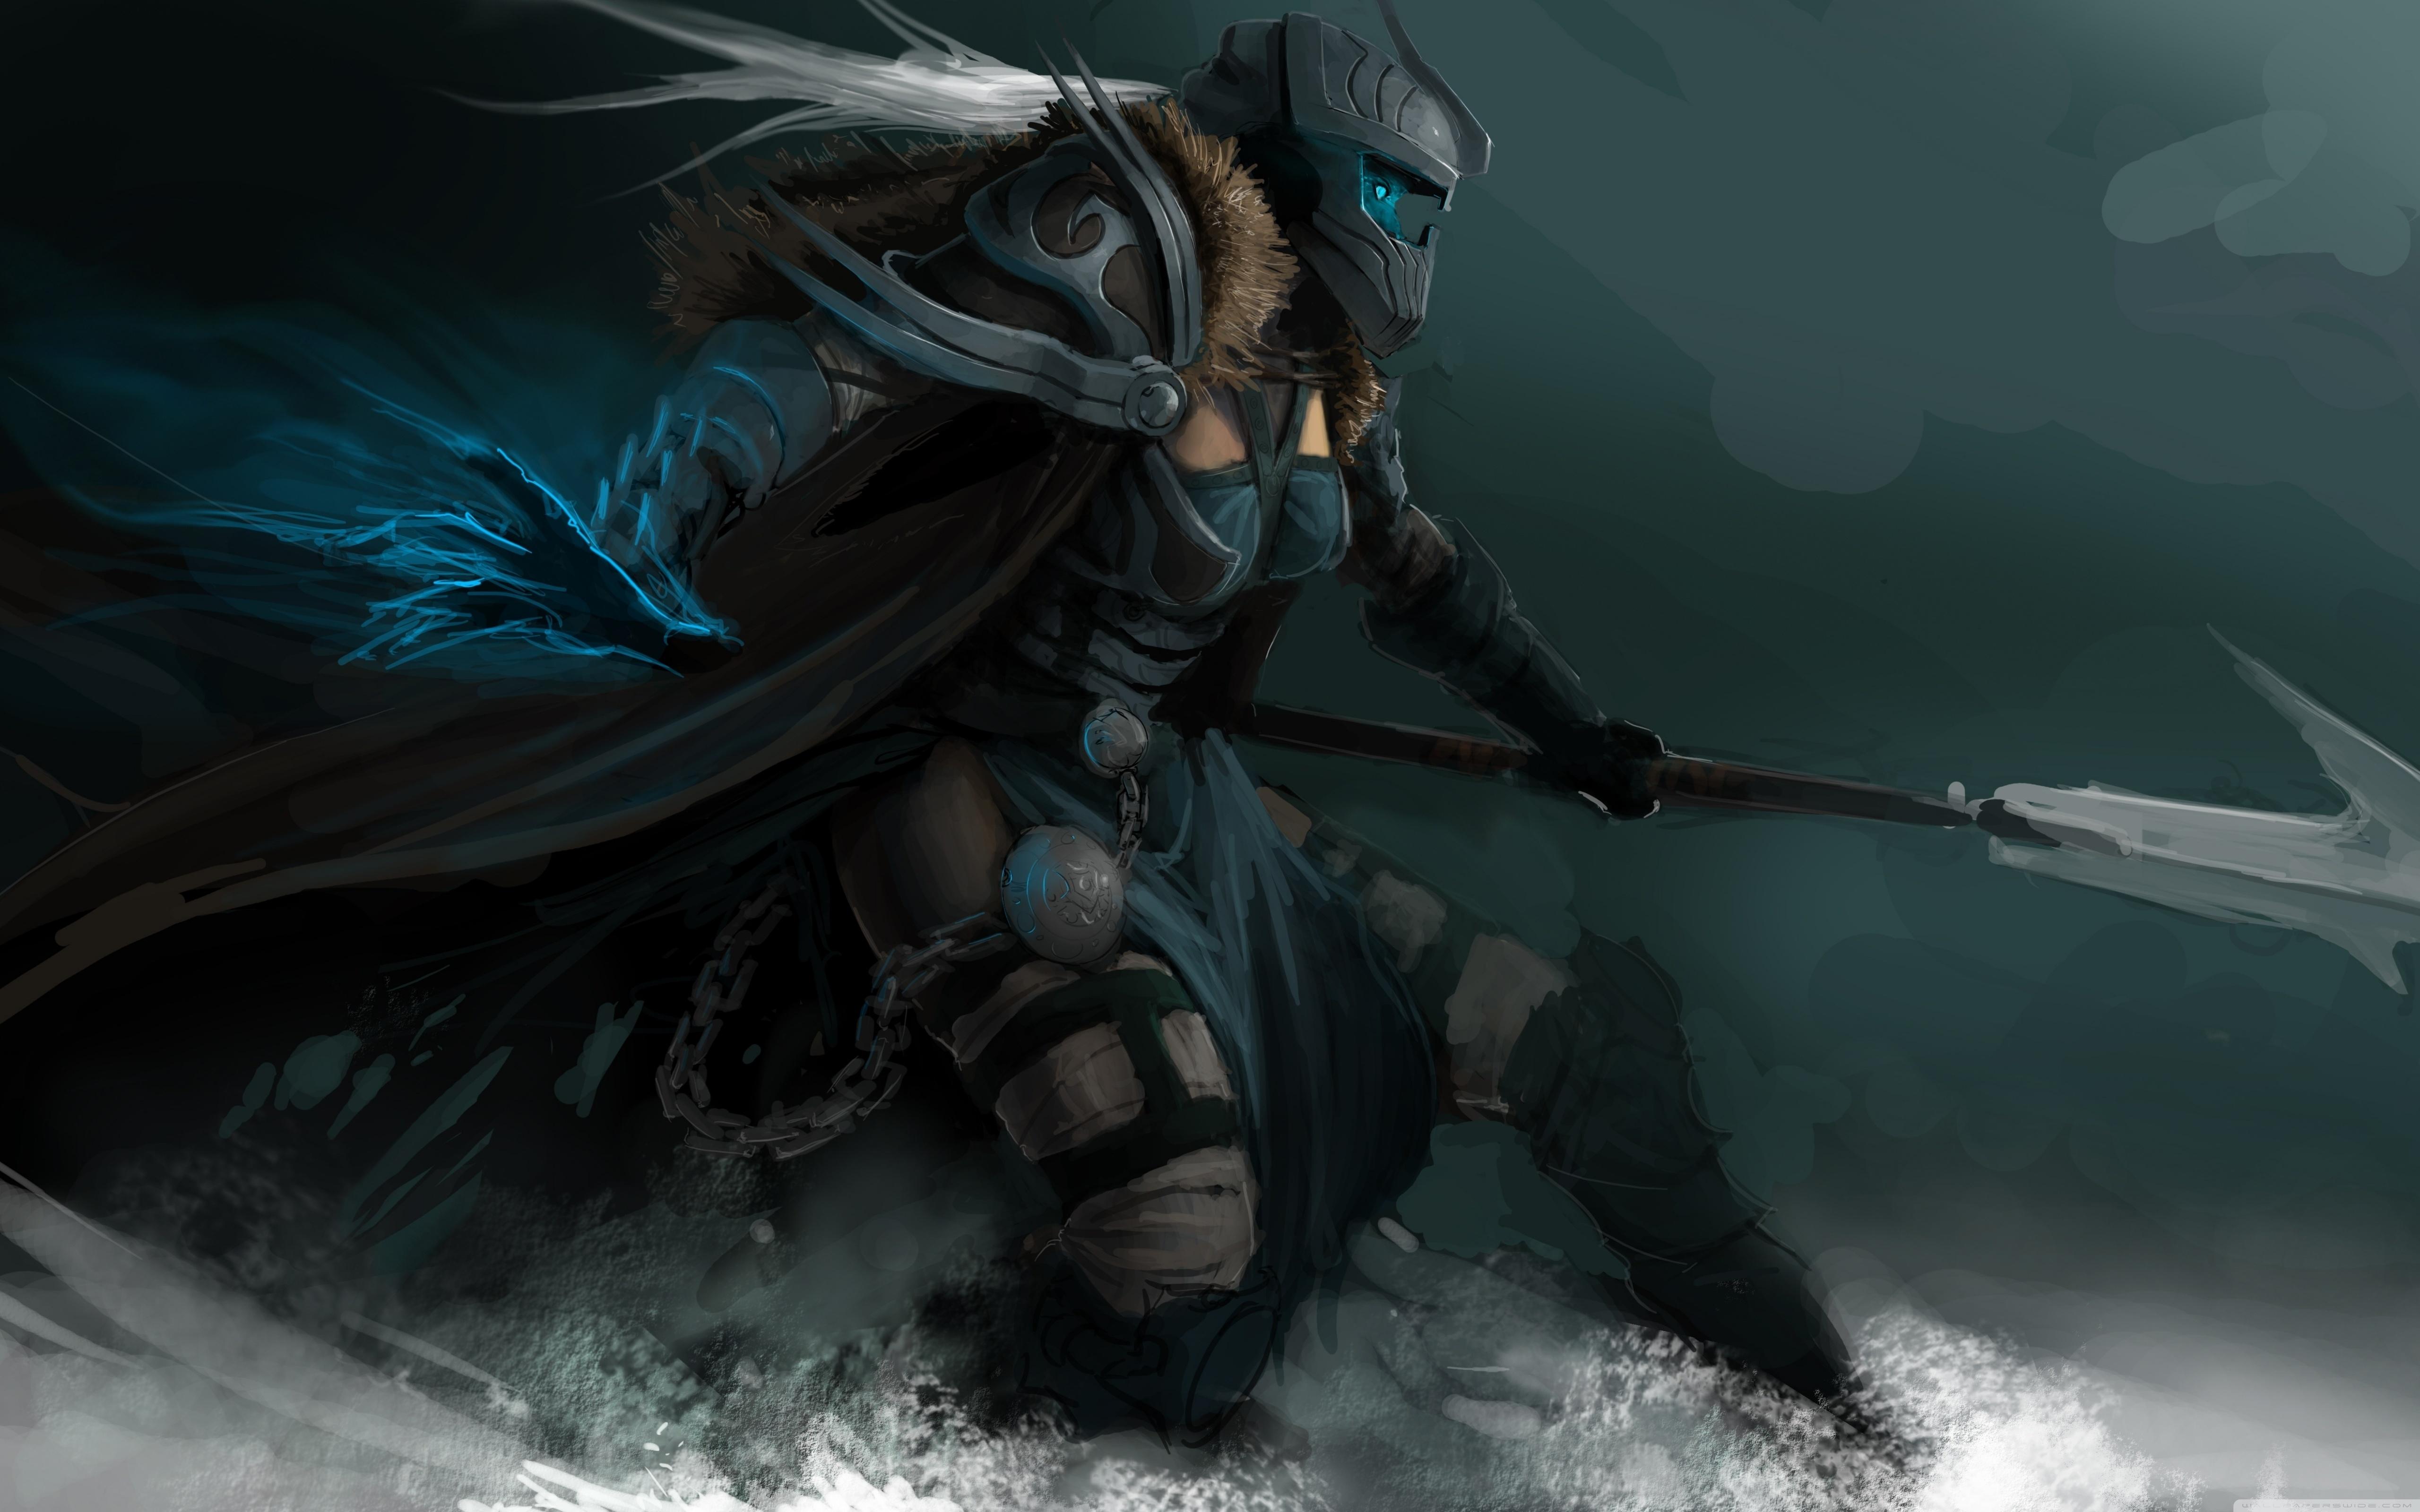 world of warcraft death knight ❤ 4k hd desktop wallpaper for 4k